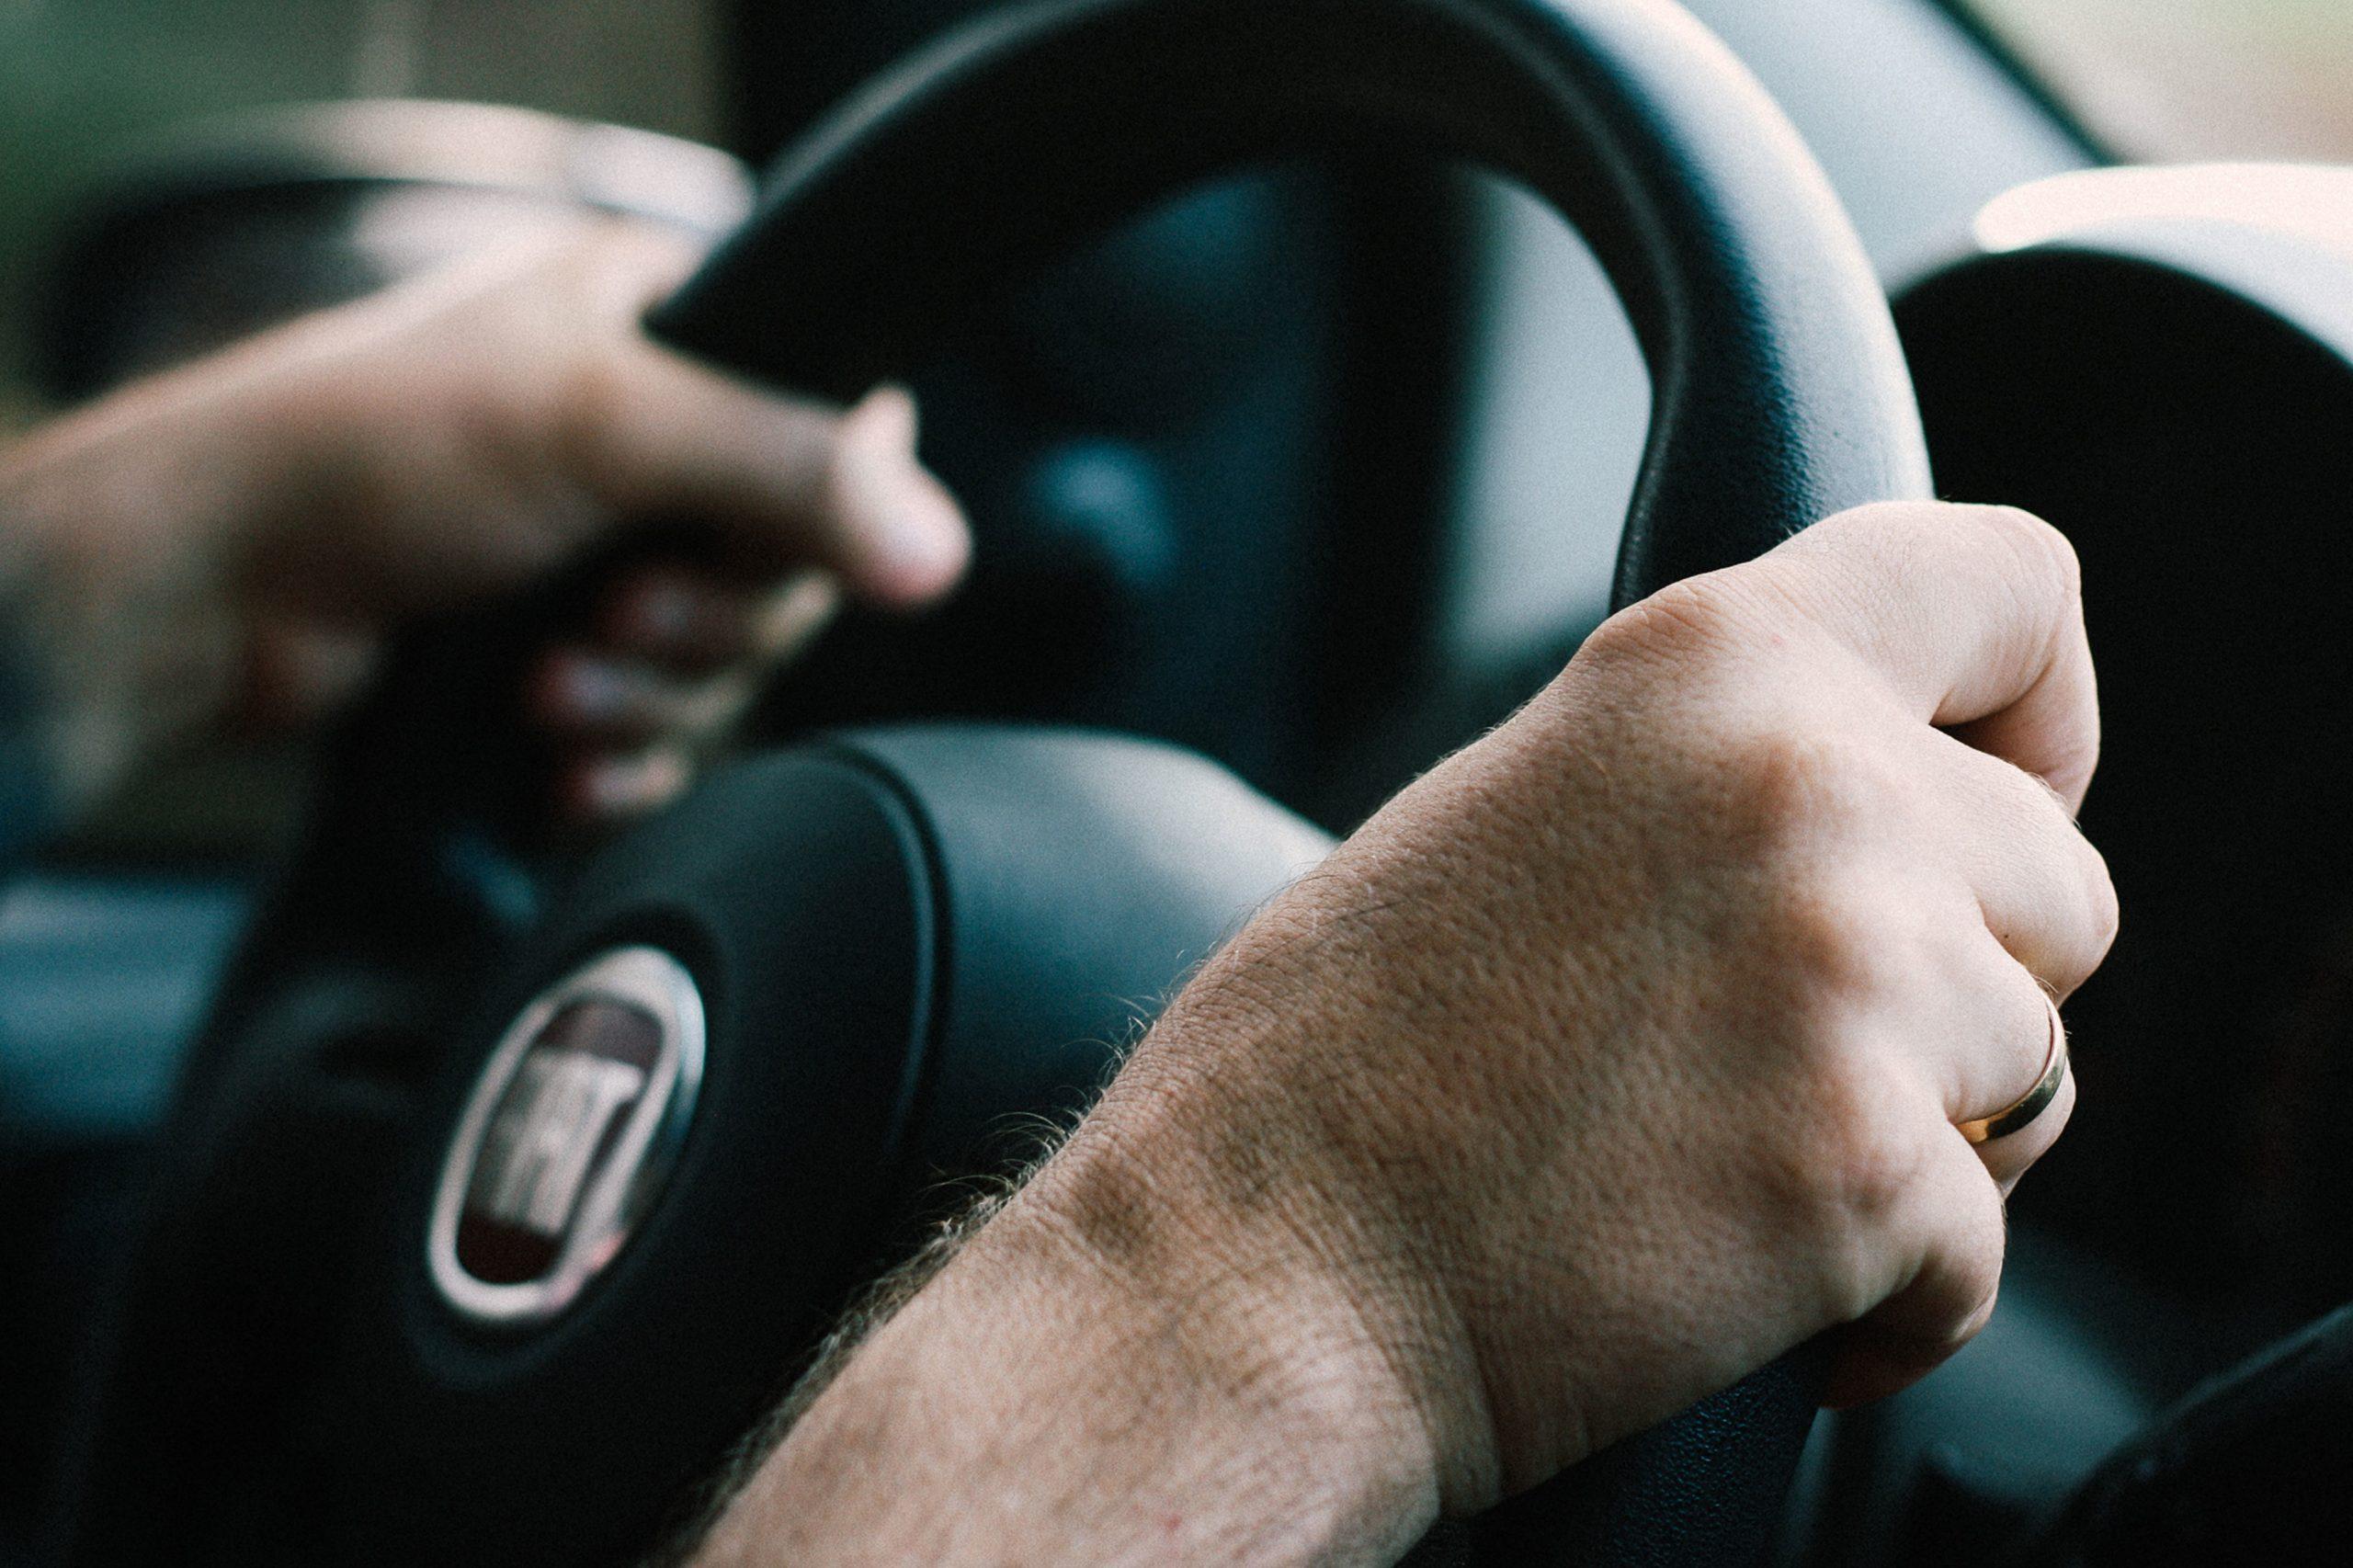 South Coast Liability Auto Insurance